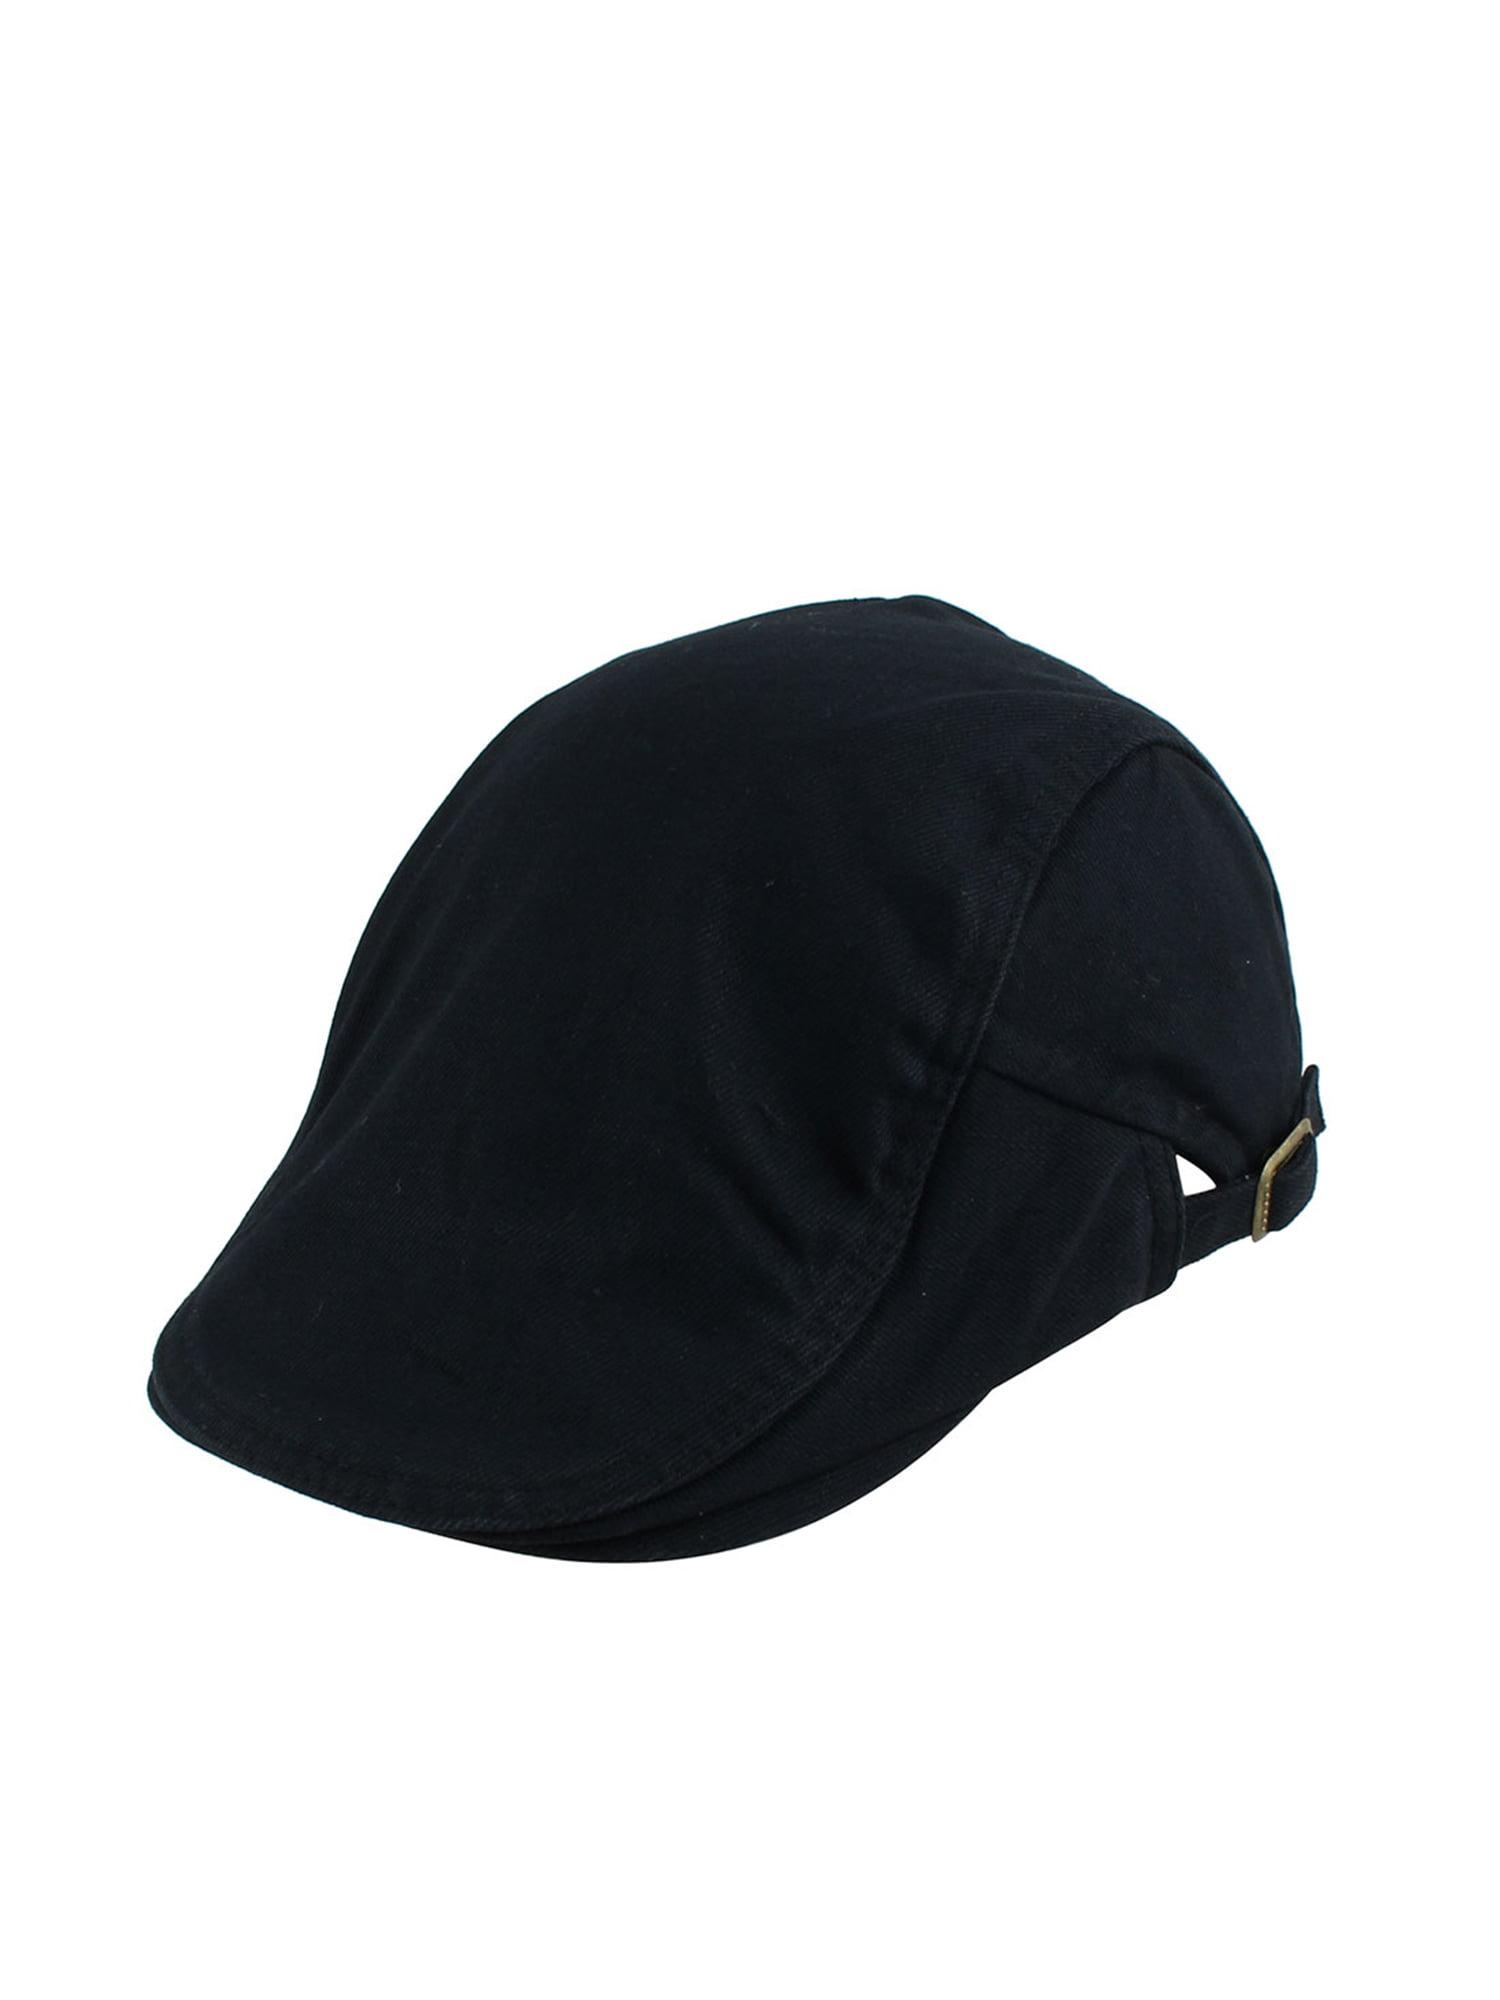 a10fb9b8522 Unique BargainsCanvas Summer Newsboy Duckbill Ivy Cap Driving Flat  Adjustable Beret Hat White